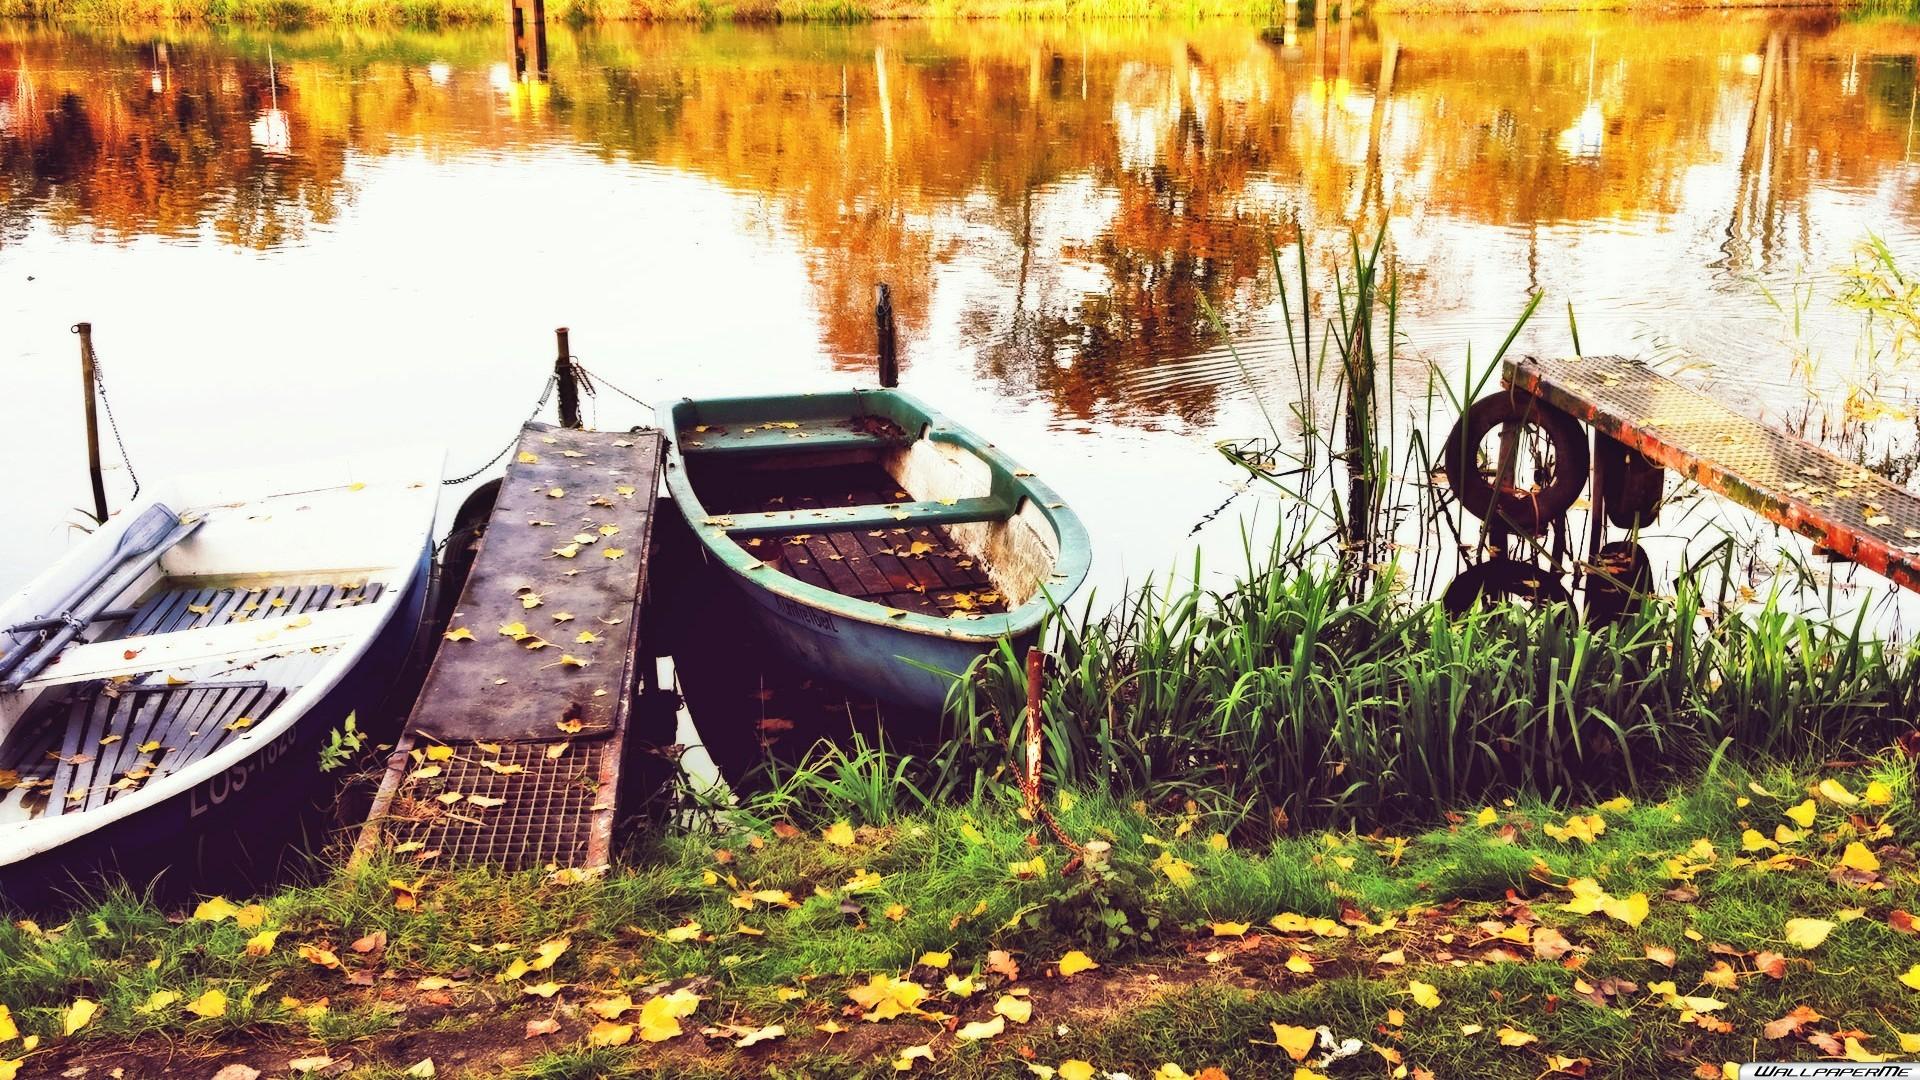 Free Beautiful Desktop Wallpapers For The Fall Die 81 Besten Herbst Hintergrundbilder Hd